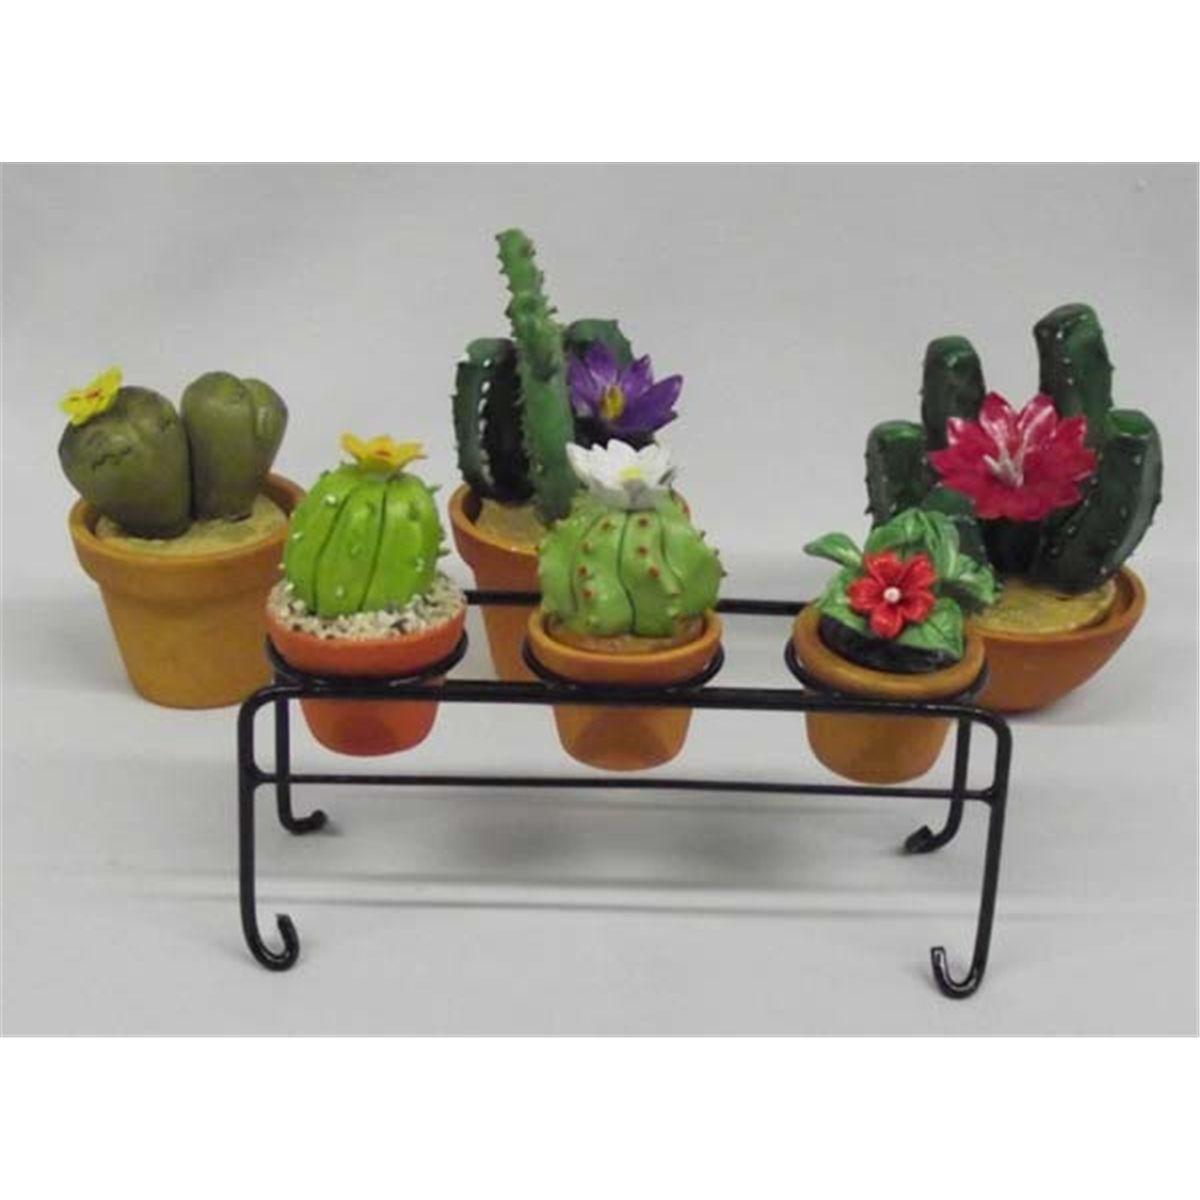 225 & Miniature Decorative Clay Flower Pots With Plants